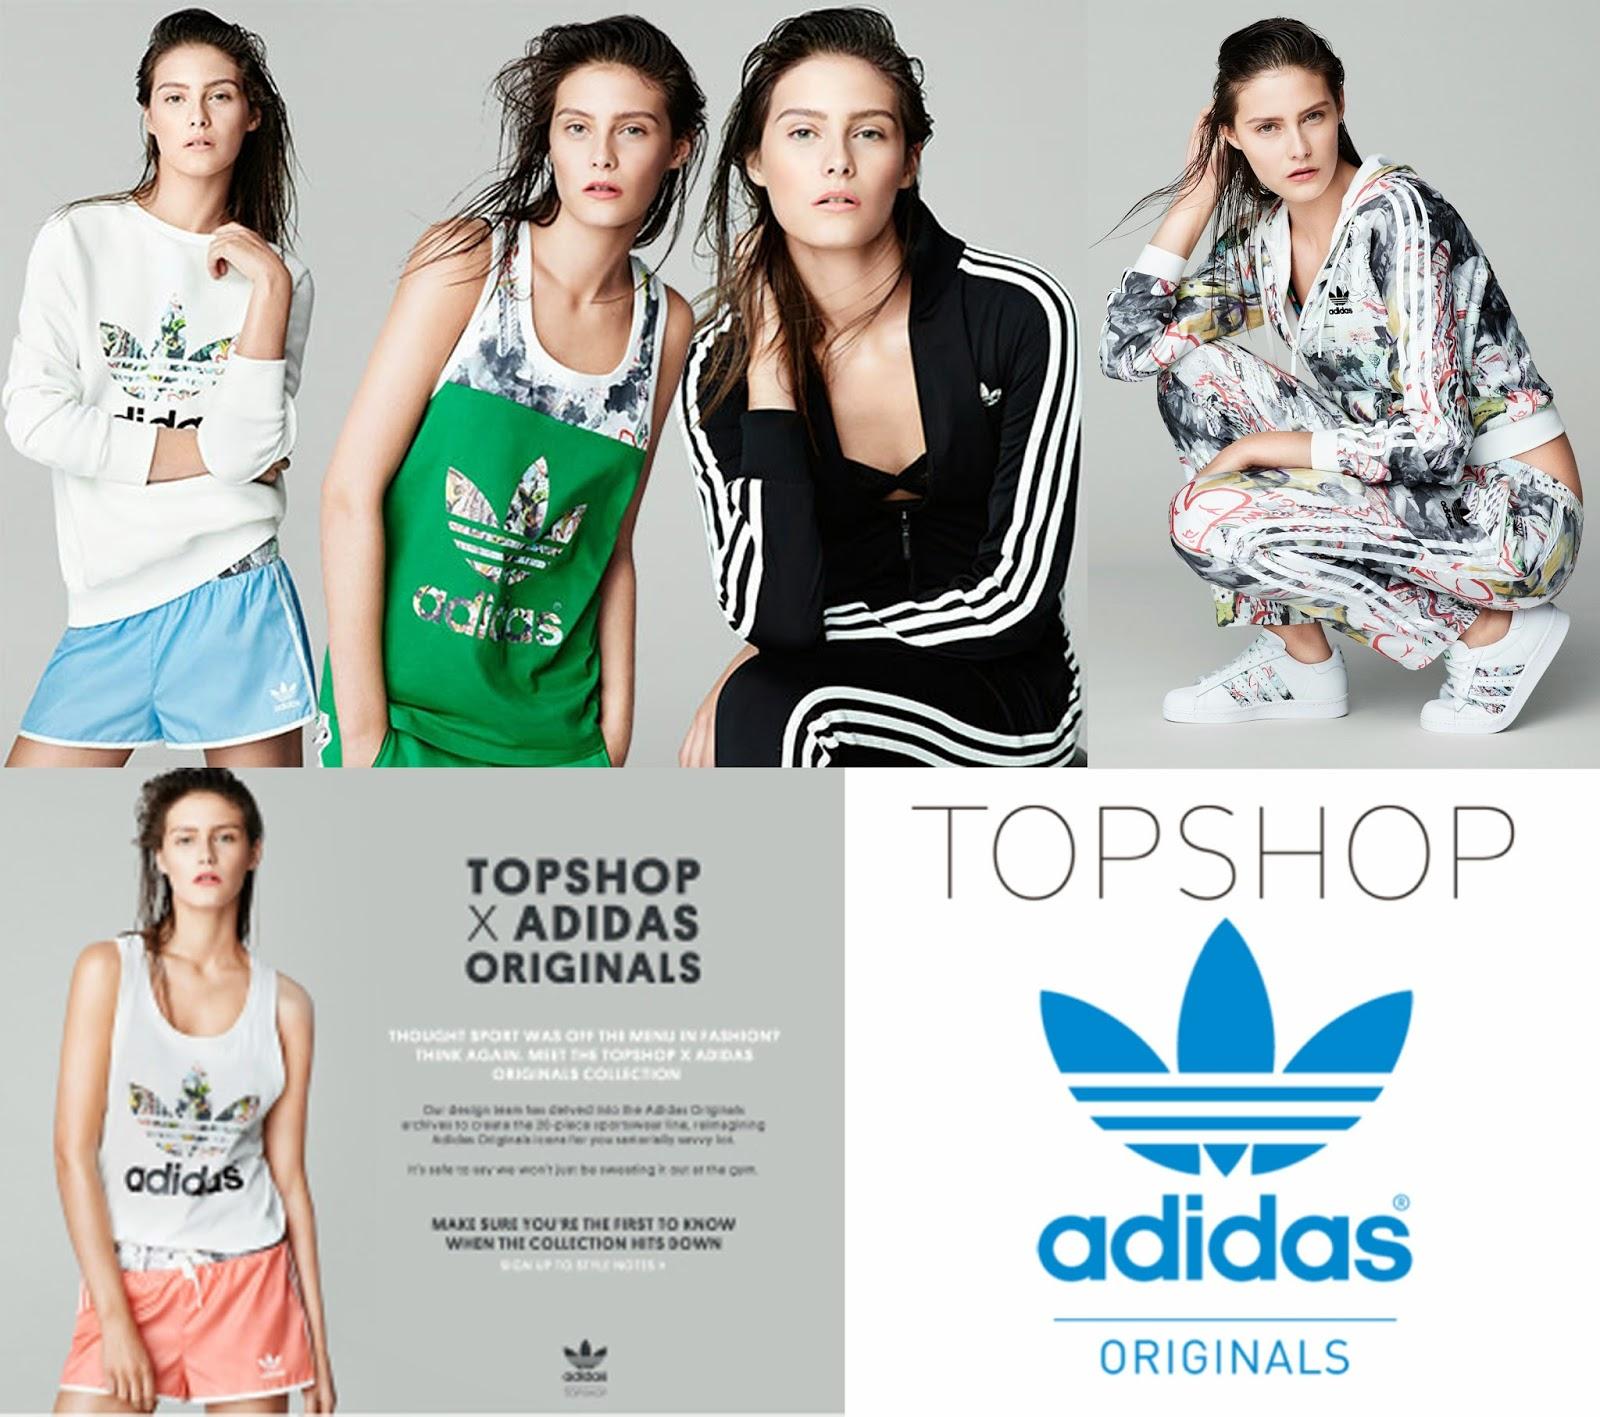 topshop adidas